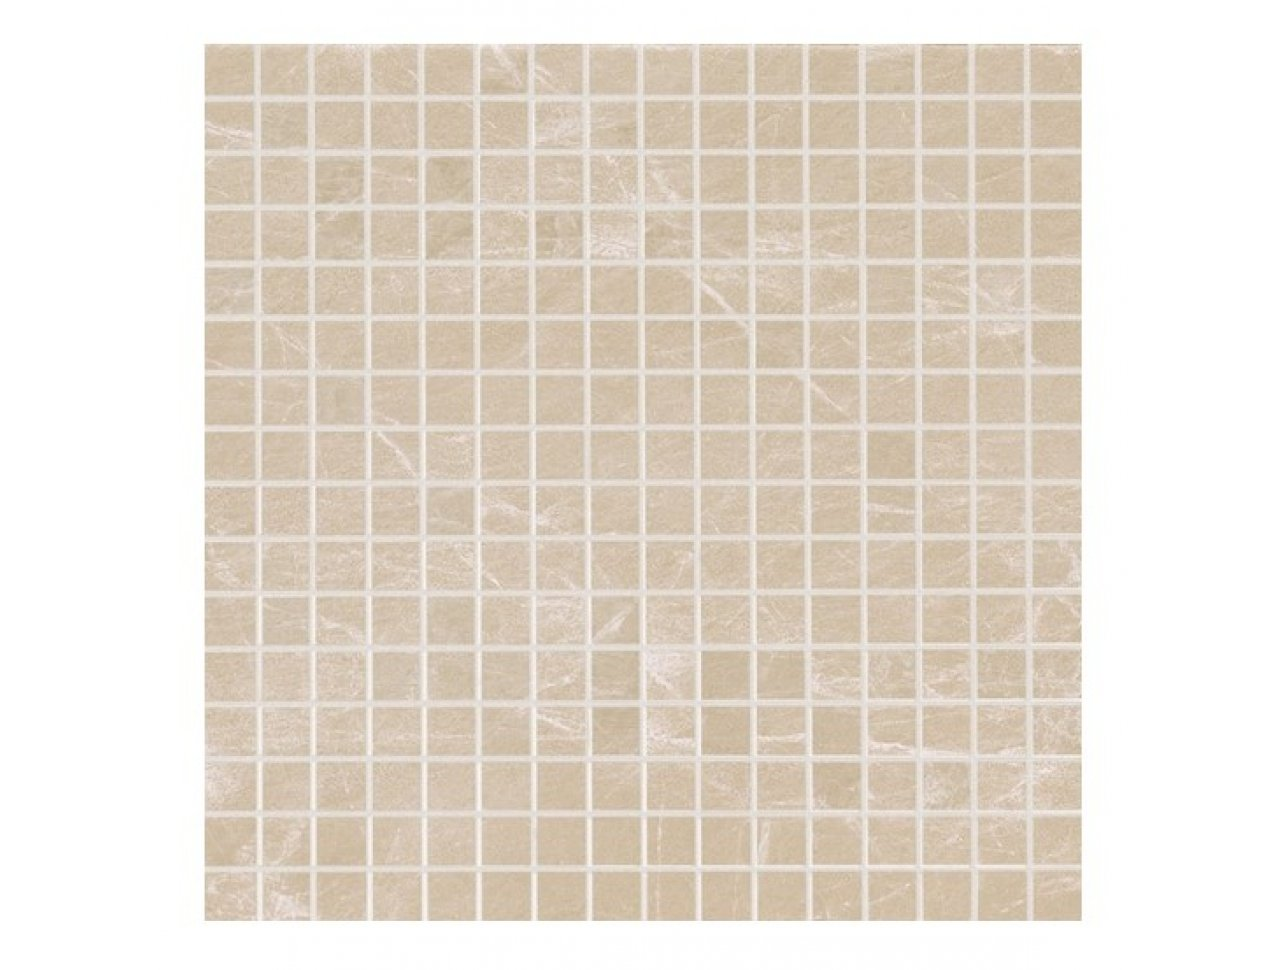 Мозаика FAP Roma Diamond Beige Duna Mosaico 30.5 x 30.5 см, Арт. fNHZ